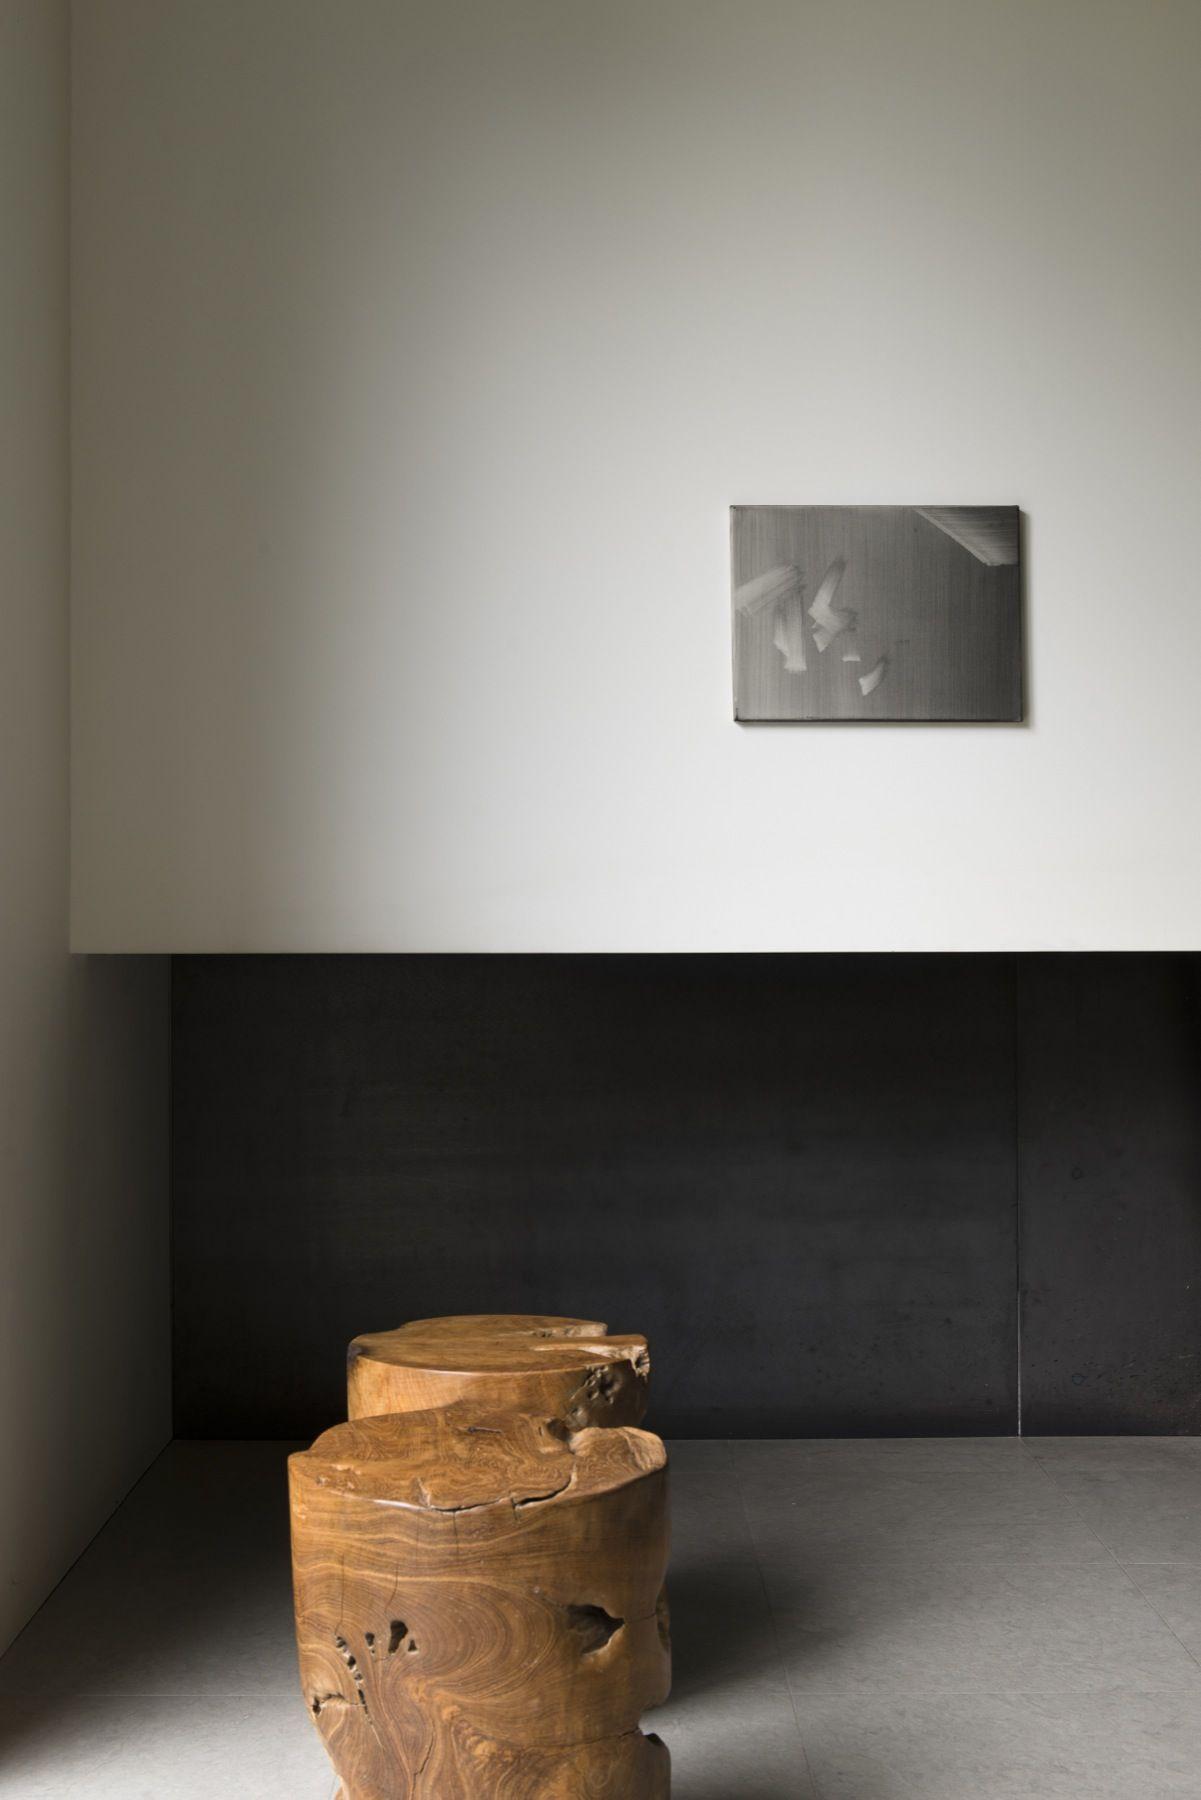 12 Inspirations For Home Improvement With Spanish Home Decorating Ideas: Interior, Interior Design Color, Interior Design